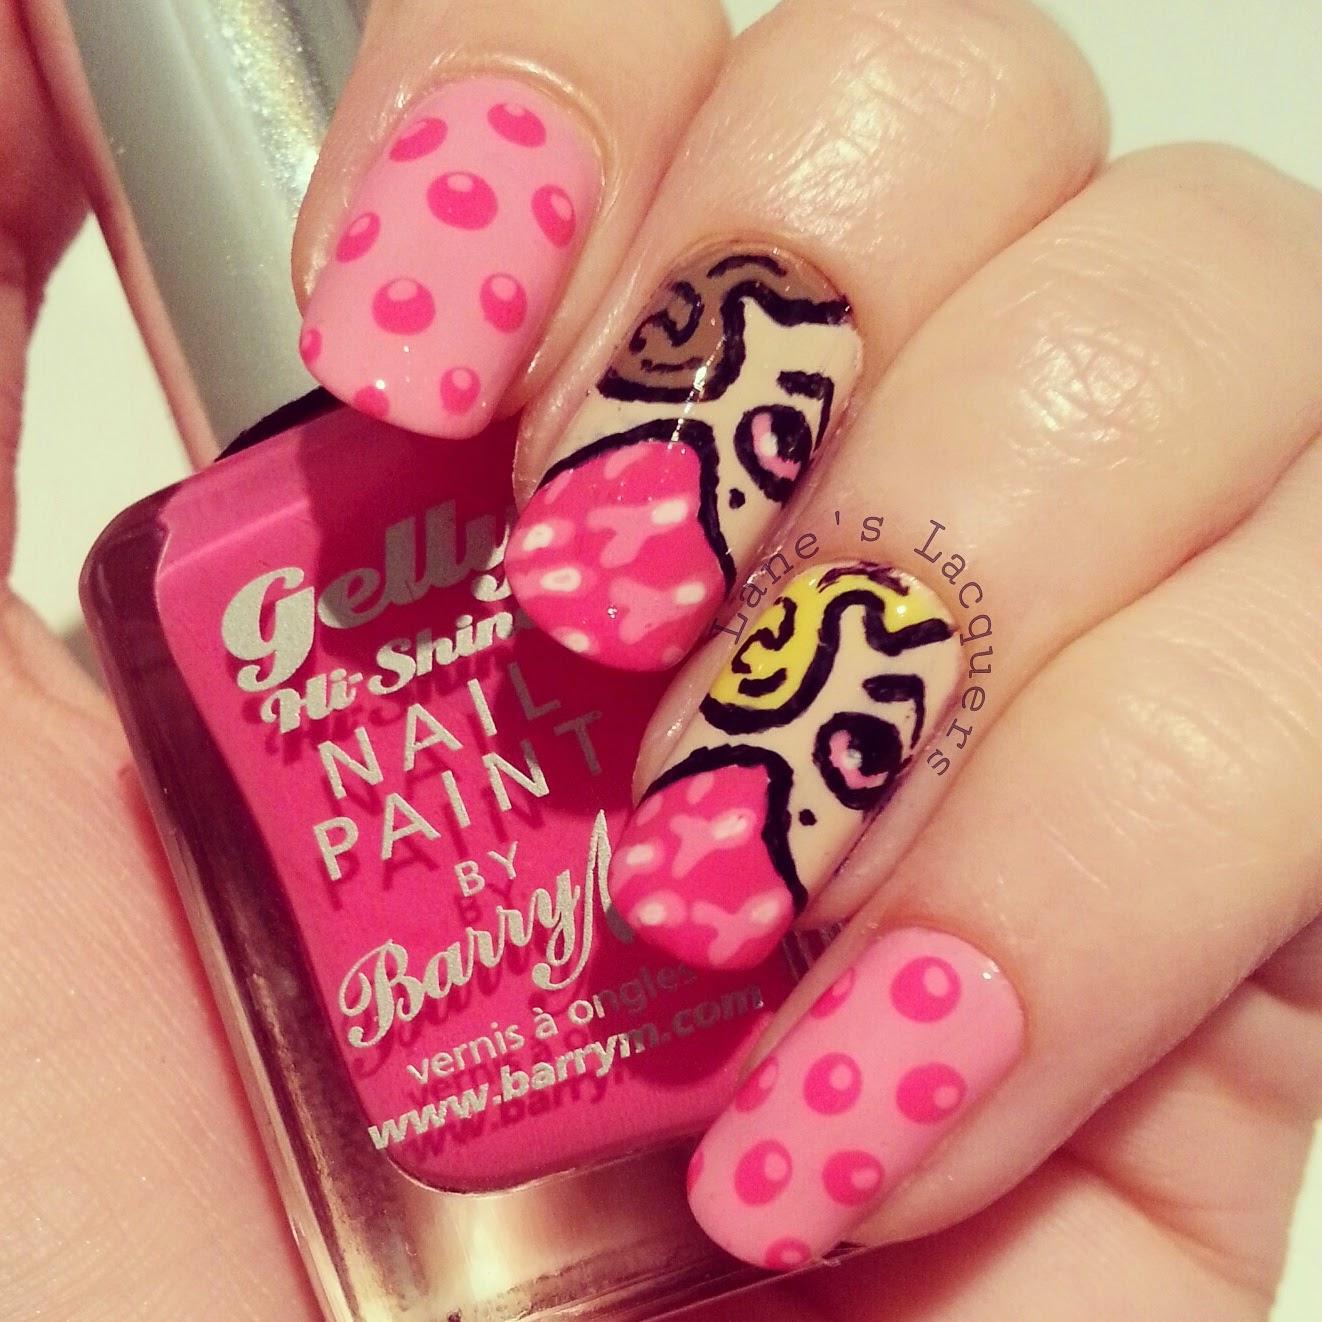 emilio-ramos-breast-cancer-awareness-nail-art (2)